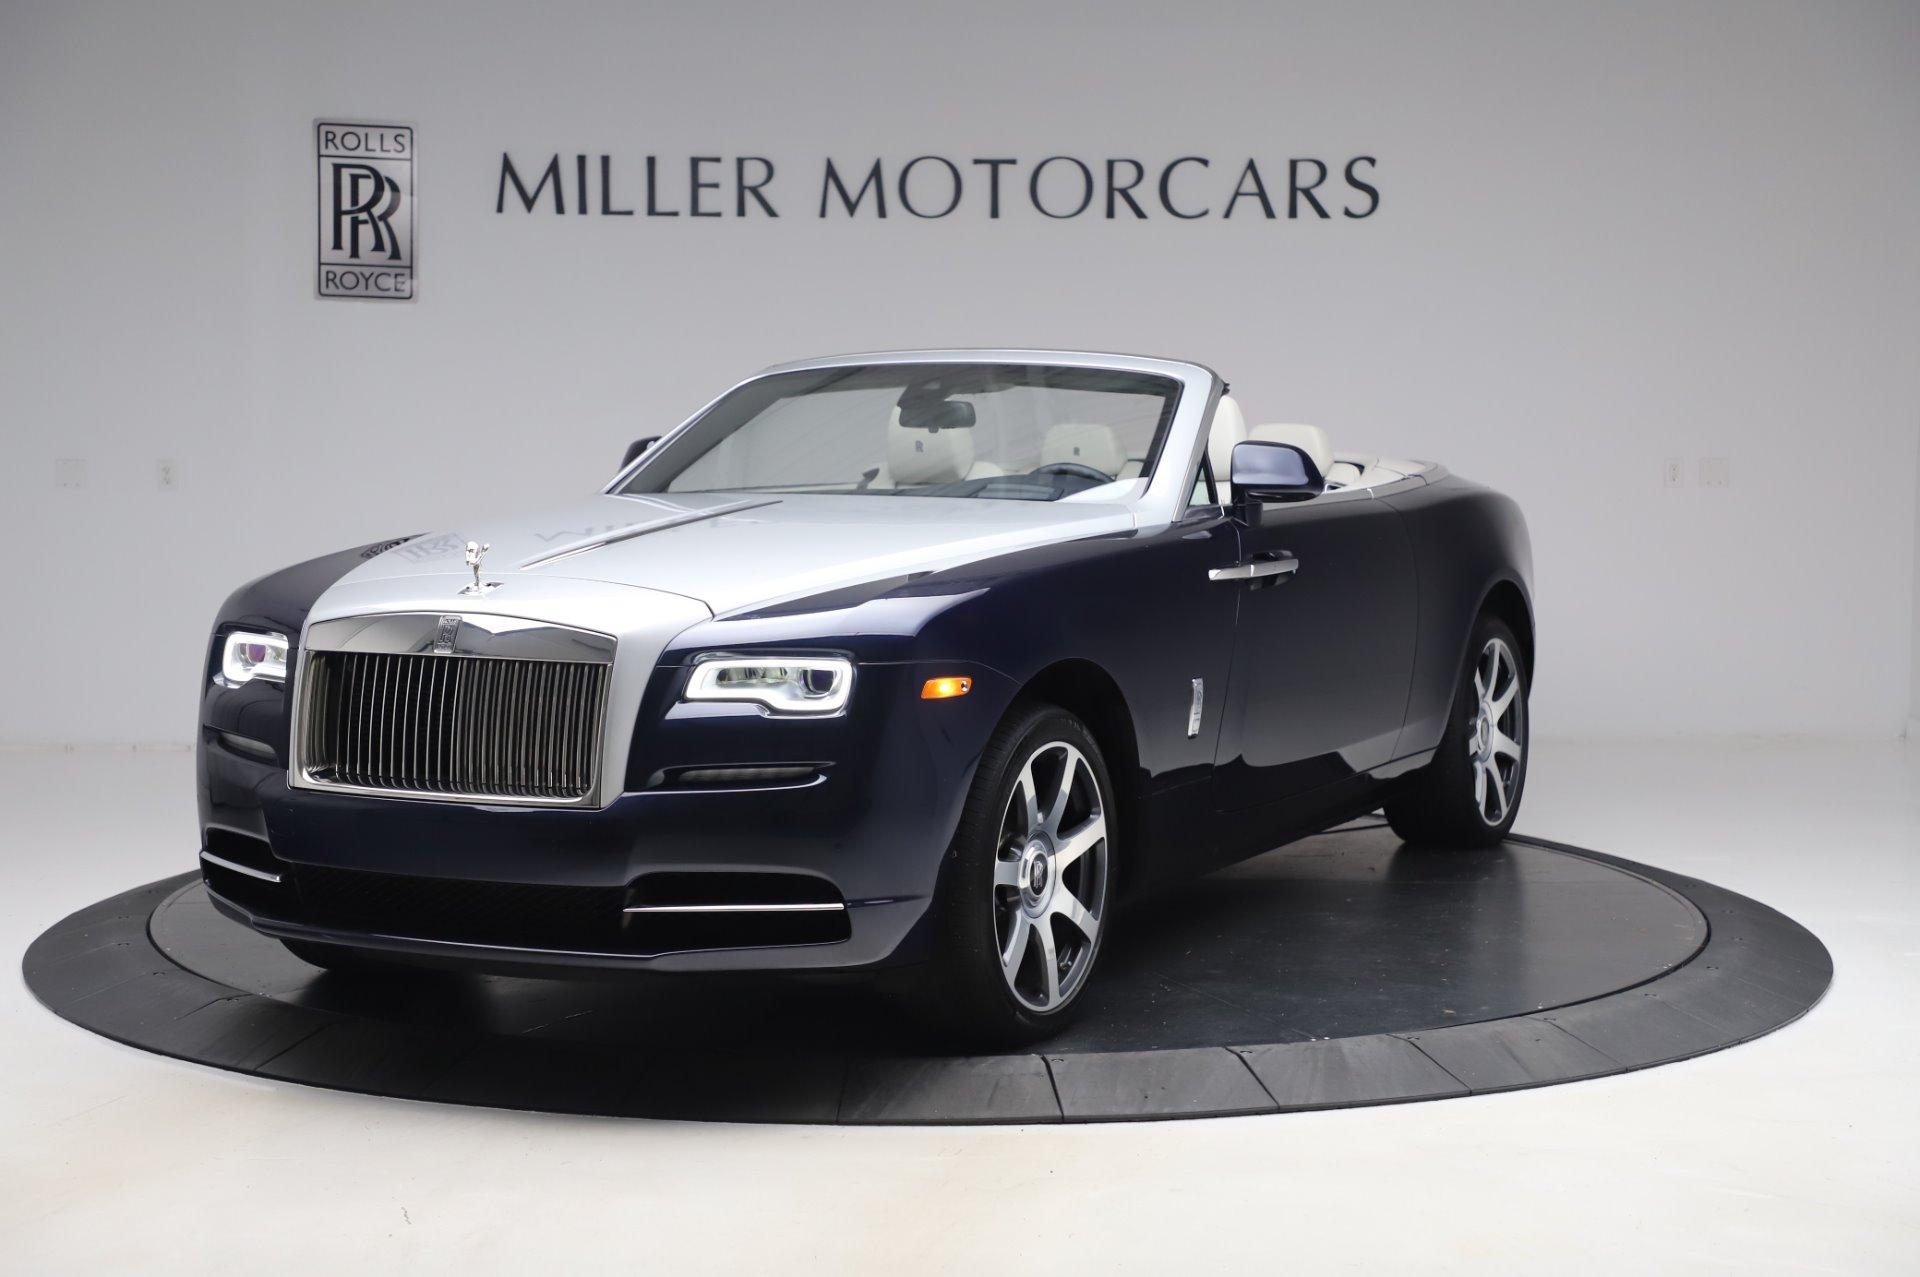 Used 2017 Rolls-Royce Dawn Base for sale $248,900 at Maserati of Westport in Westport CT 06880 1